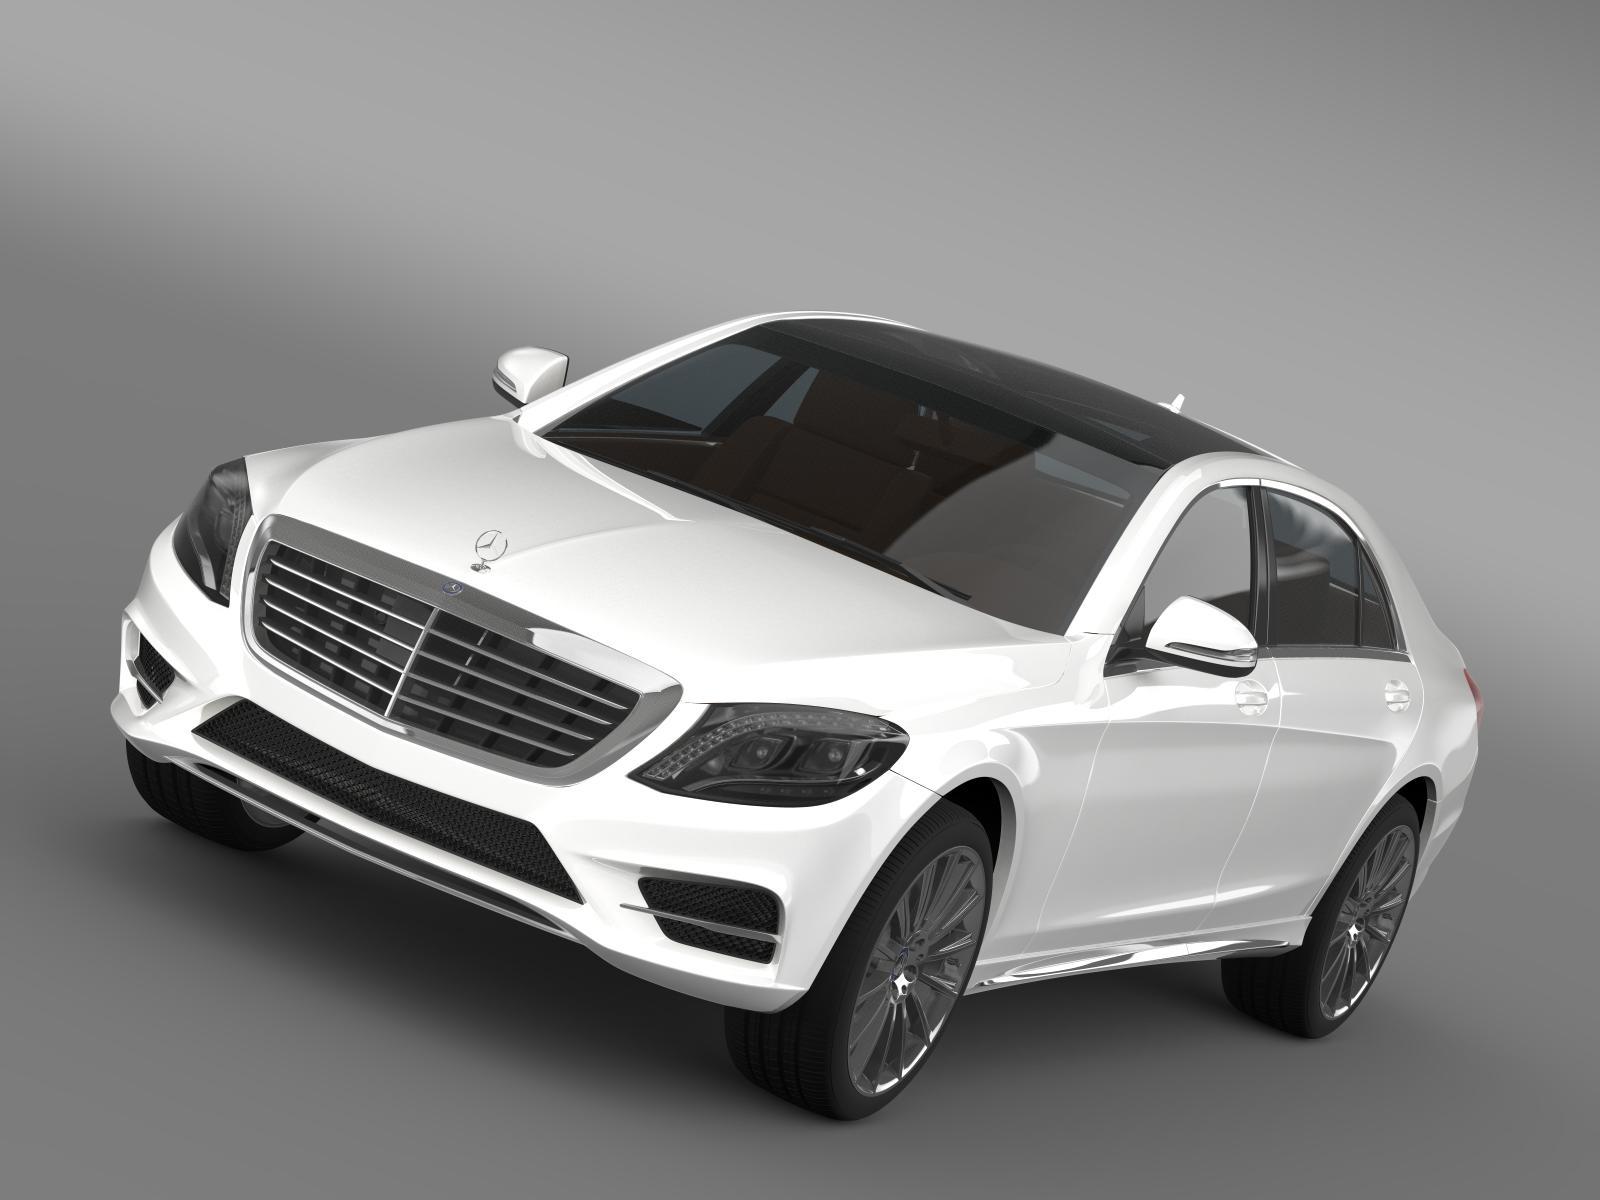 amg mercedes benz s 350 bluetec w222 2013 3d model 3ds fbx c4d lwo ma mb hrc xsi obj 204598